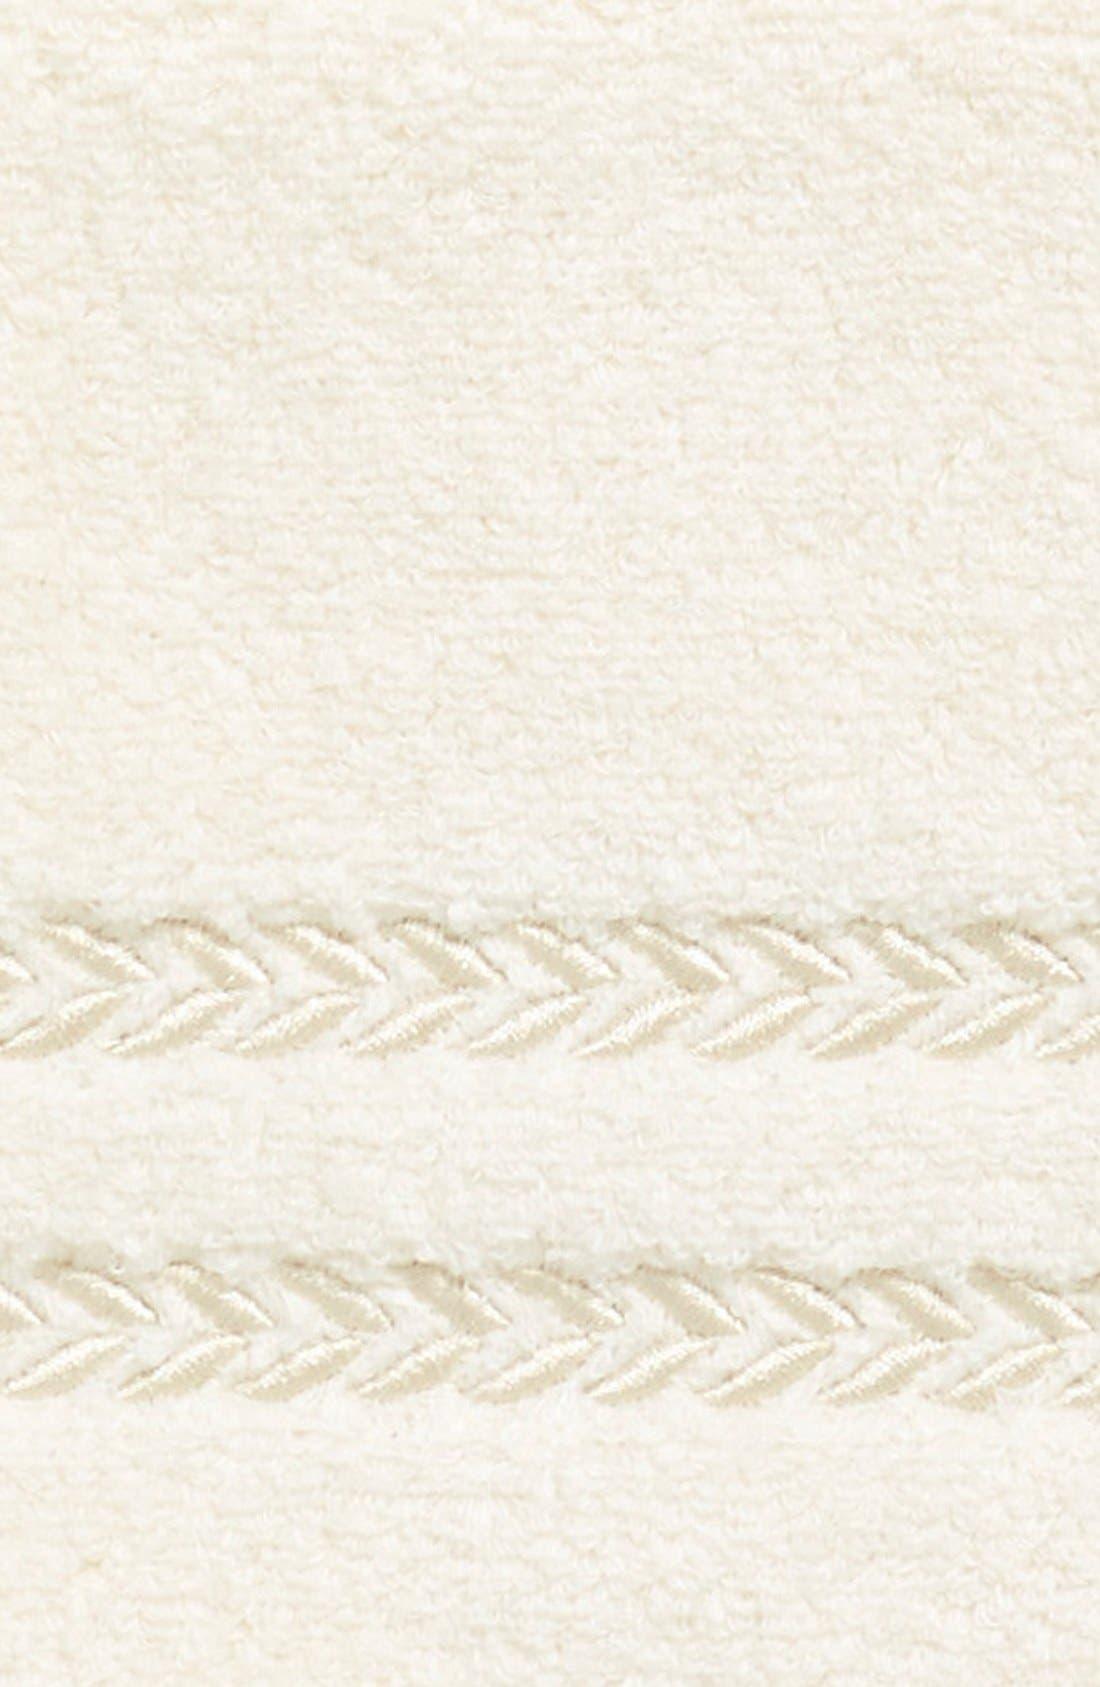 'Pearl Essence' Wash Towel,                             Alternate thumbnail 16, color,